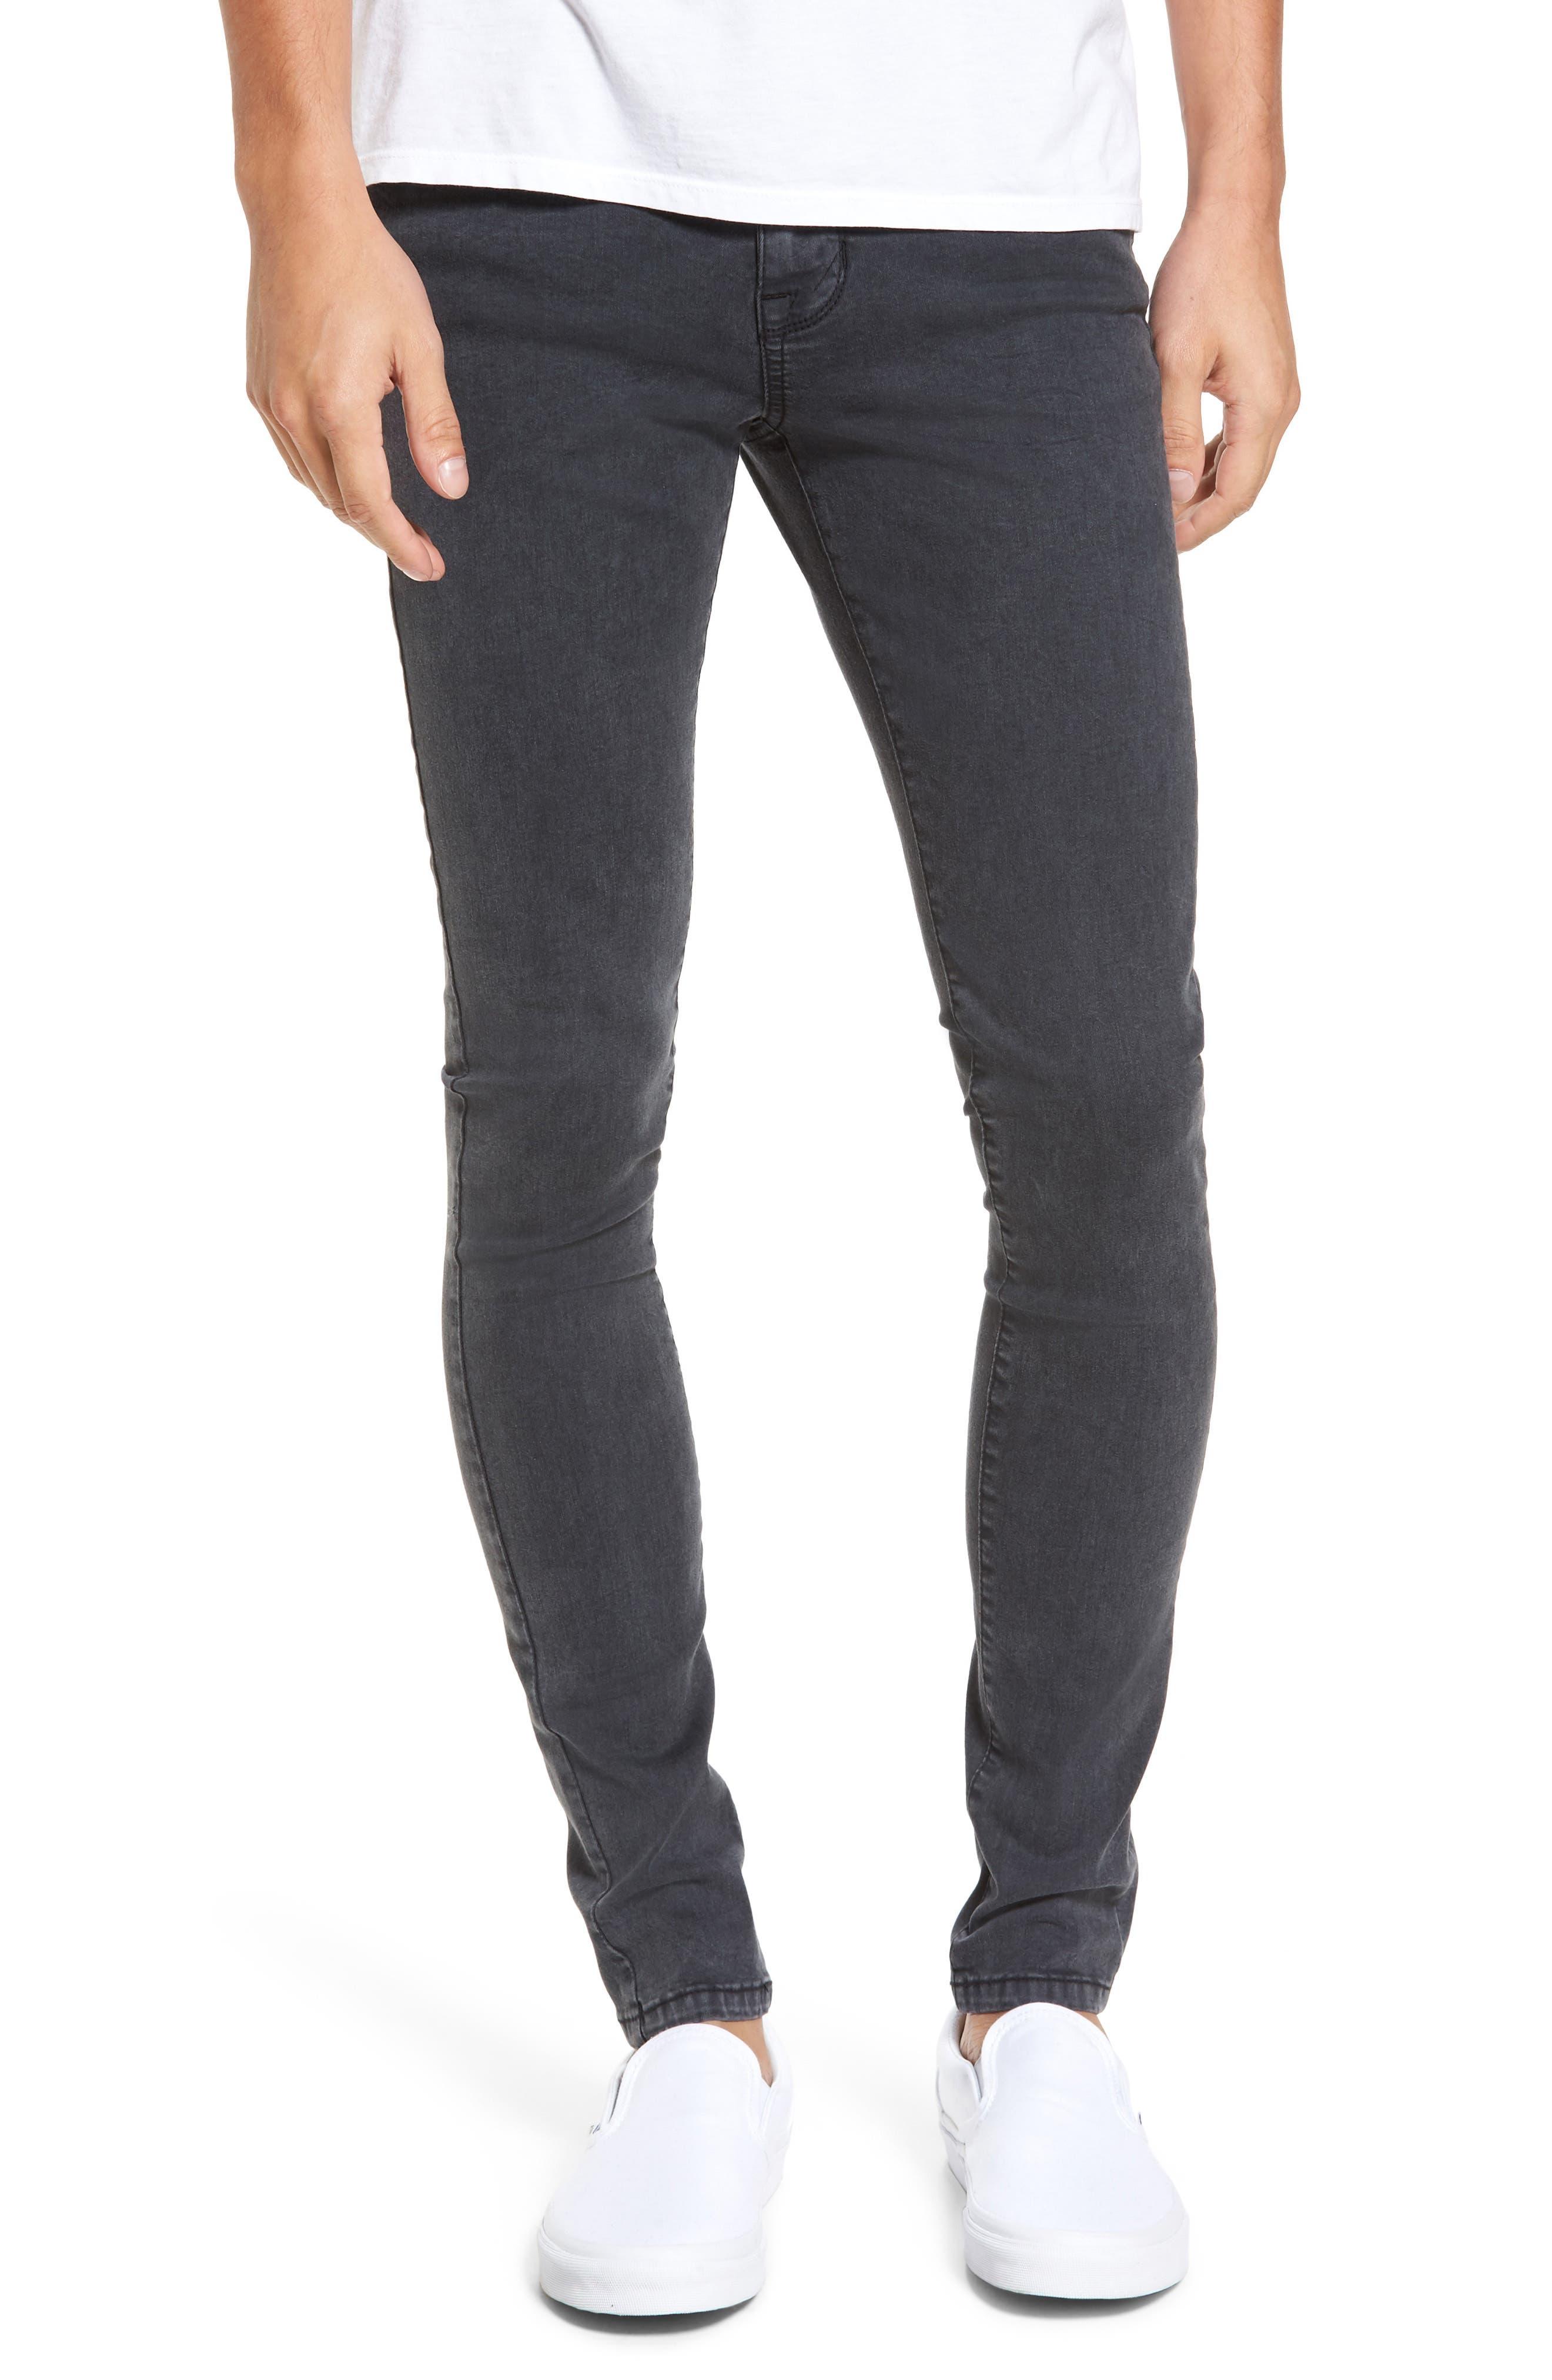 Dr. Denim Supply Co. Leroy Slim Fit Jeans (Grey Lush)